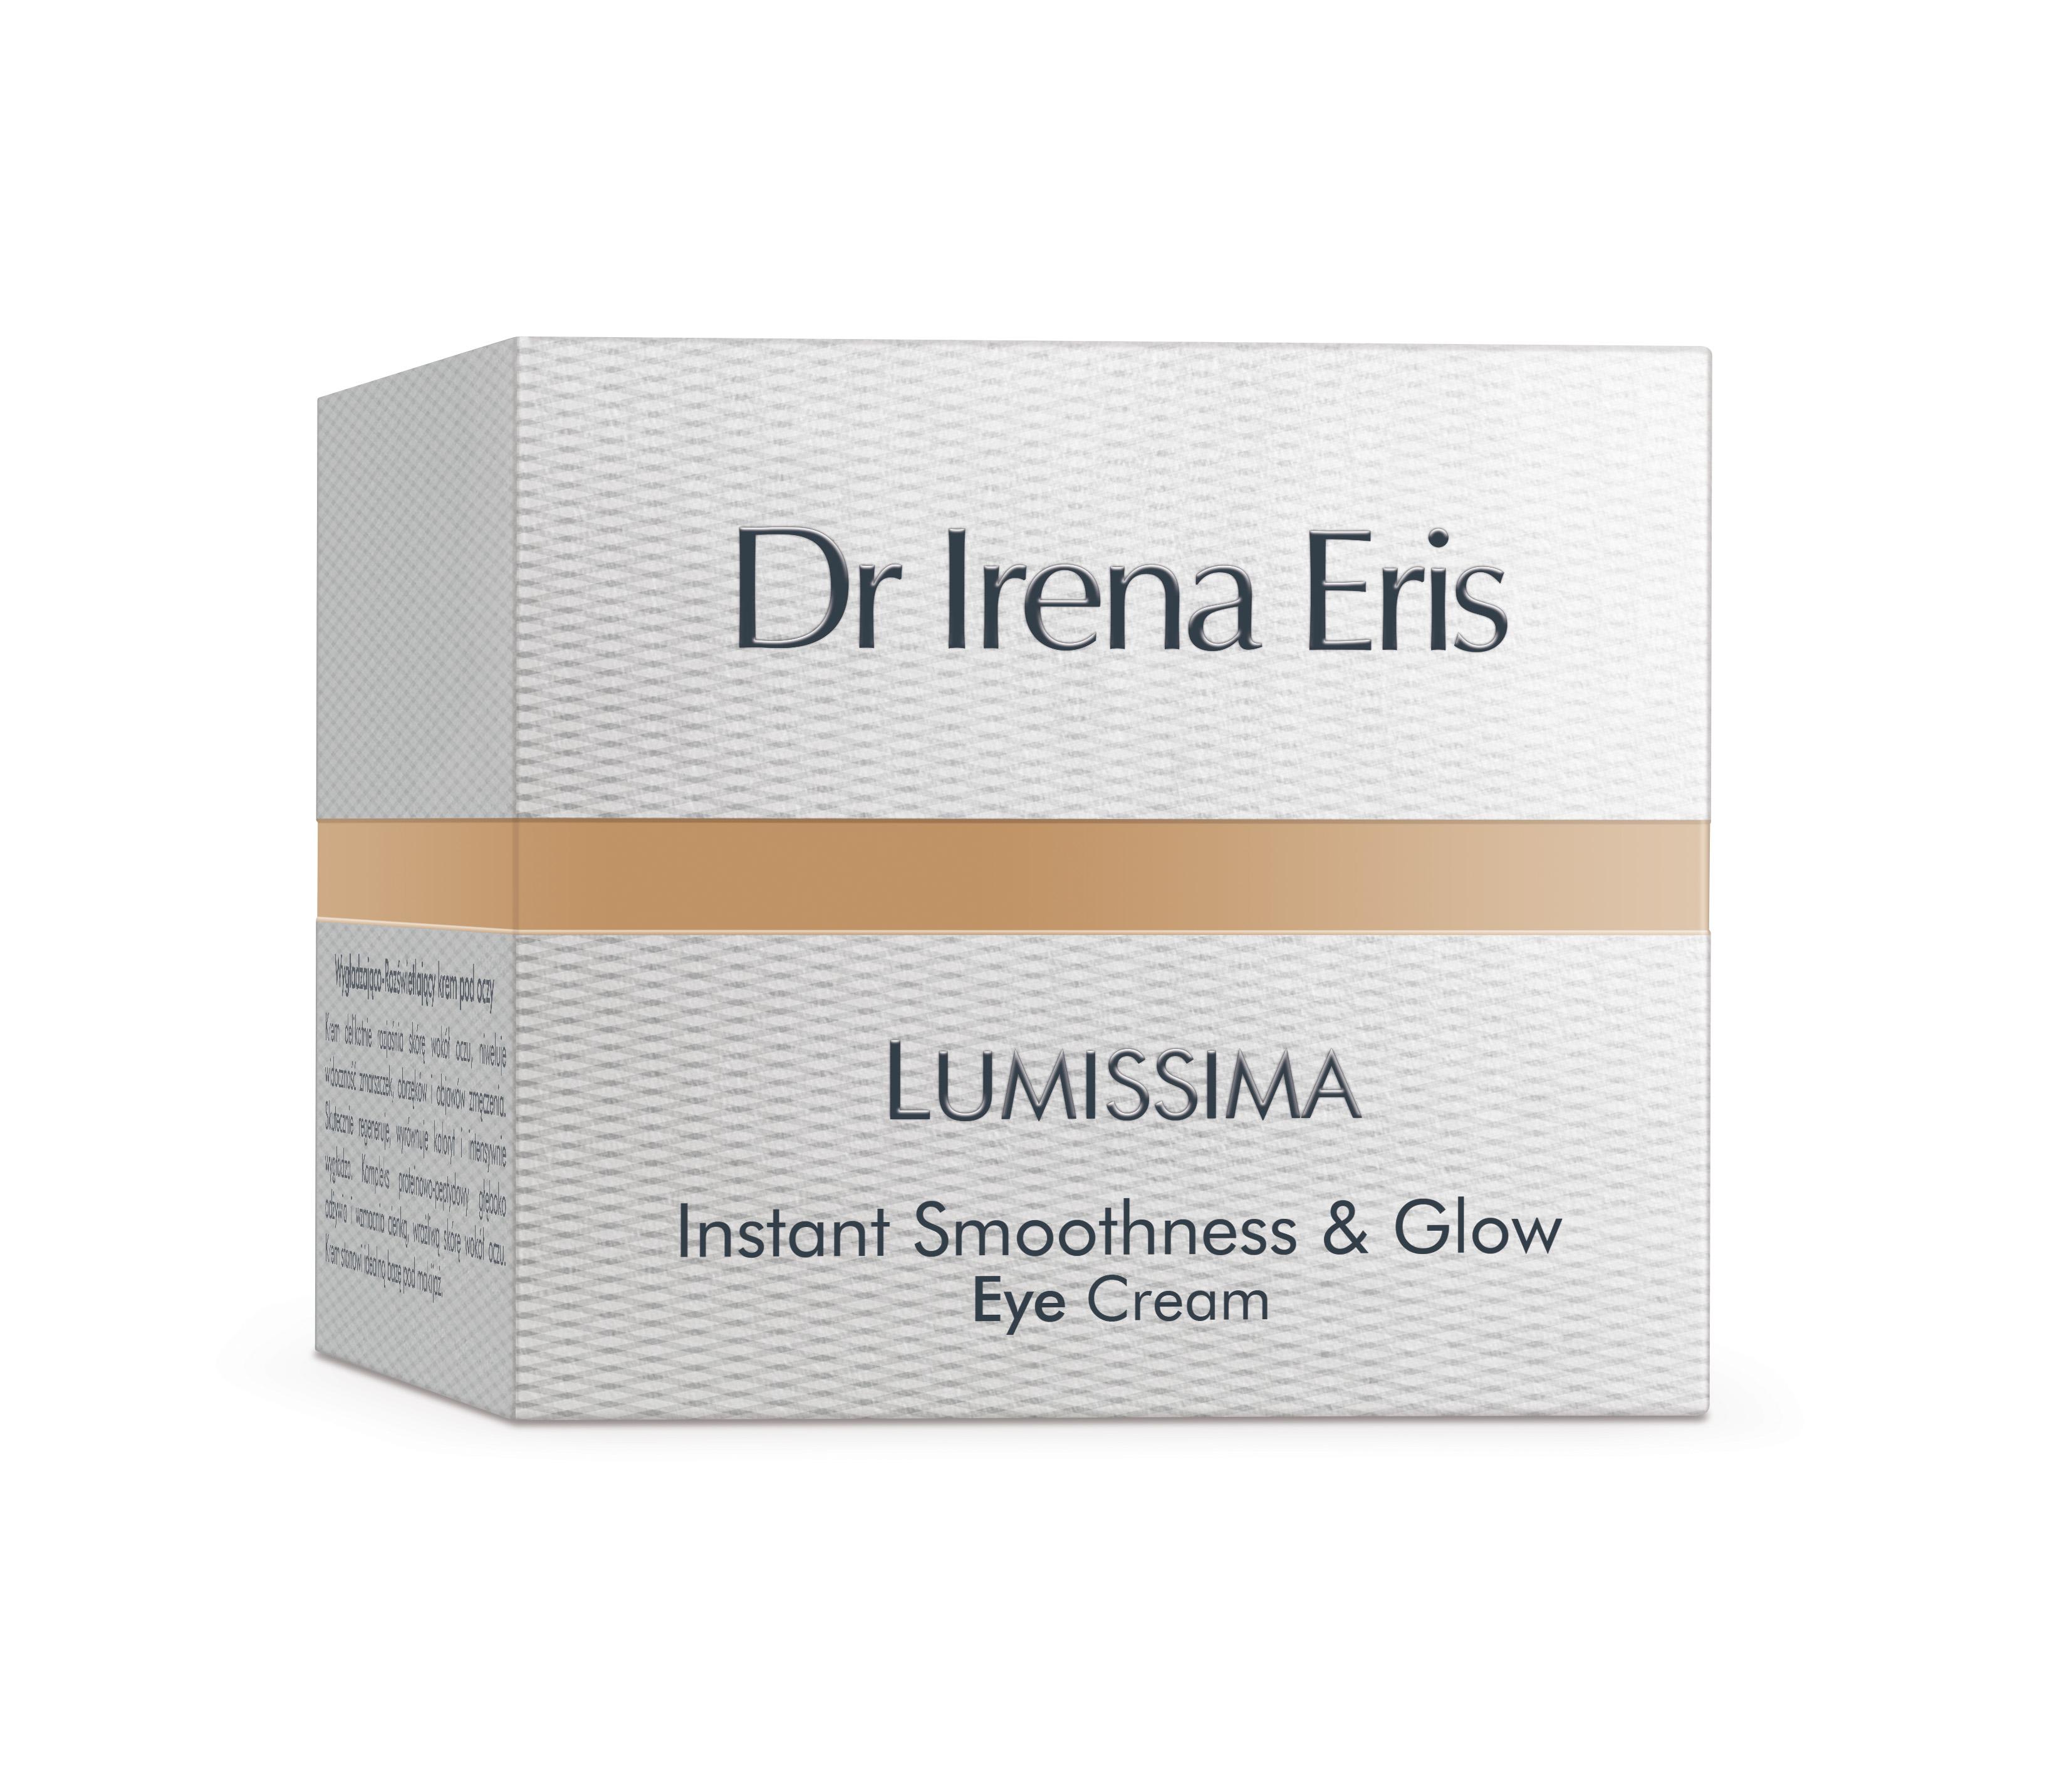 Dr Irena Eris Lumissima Instant Smoothness & Glow Eye Cream, 15 ml